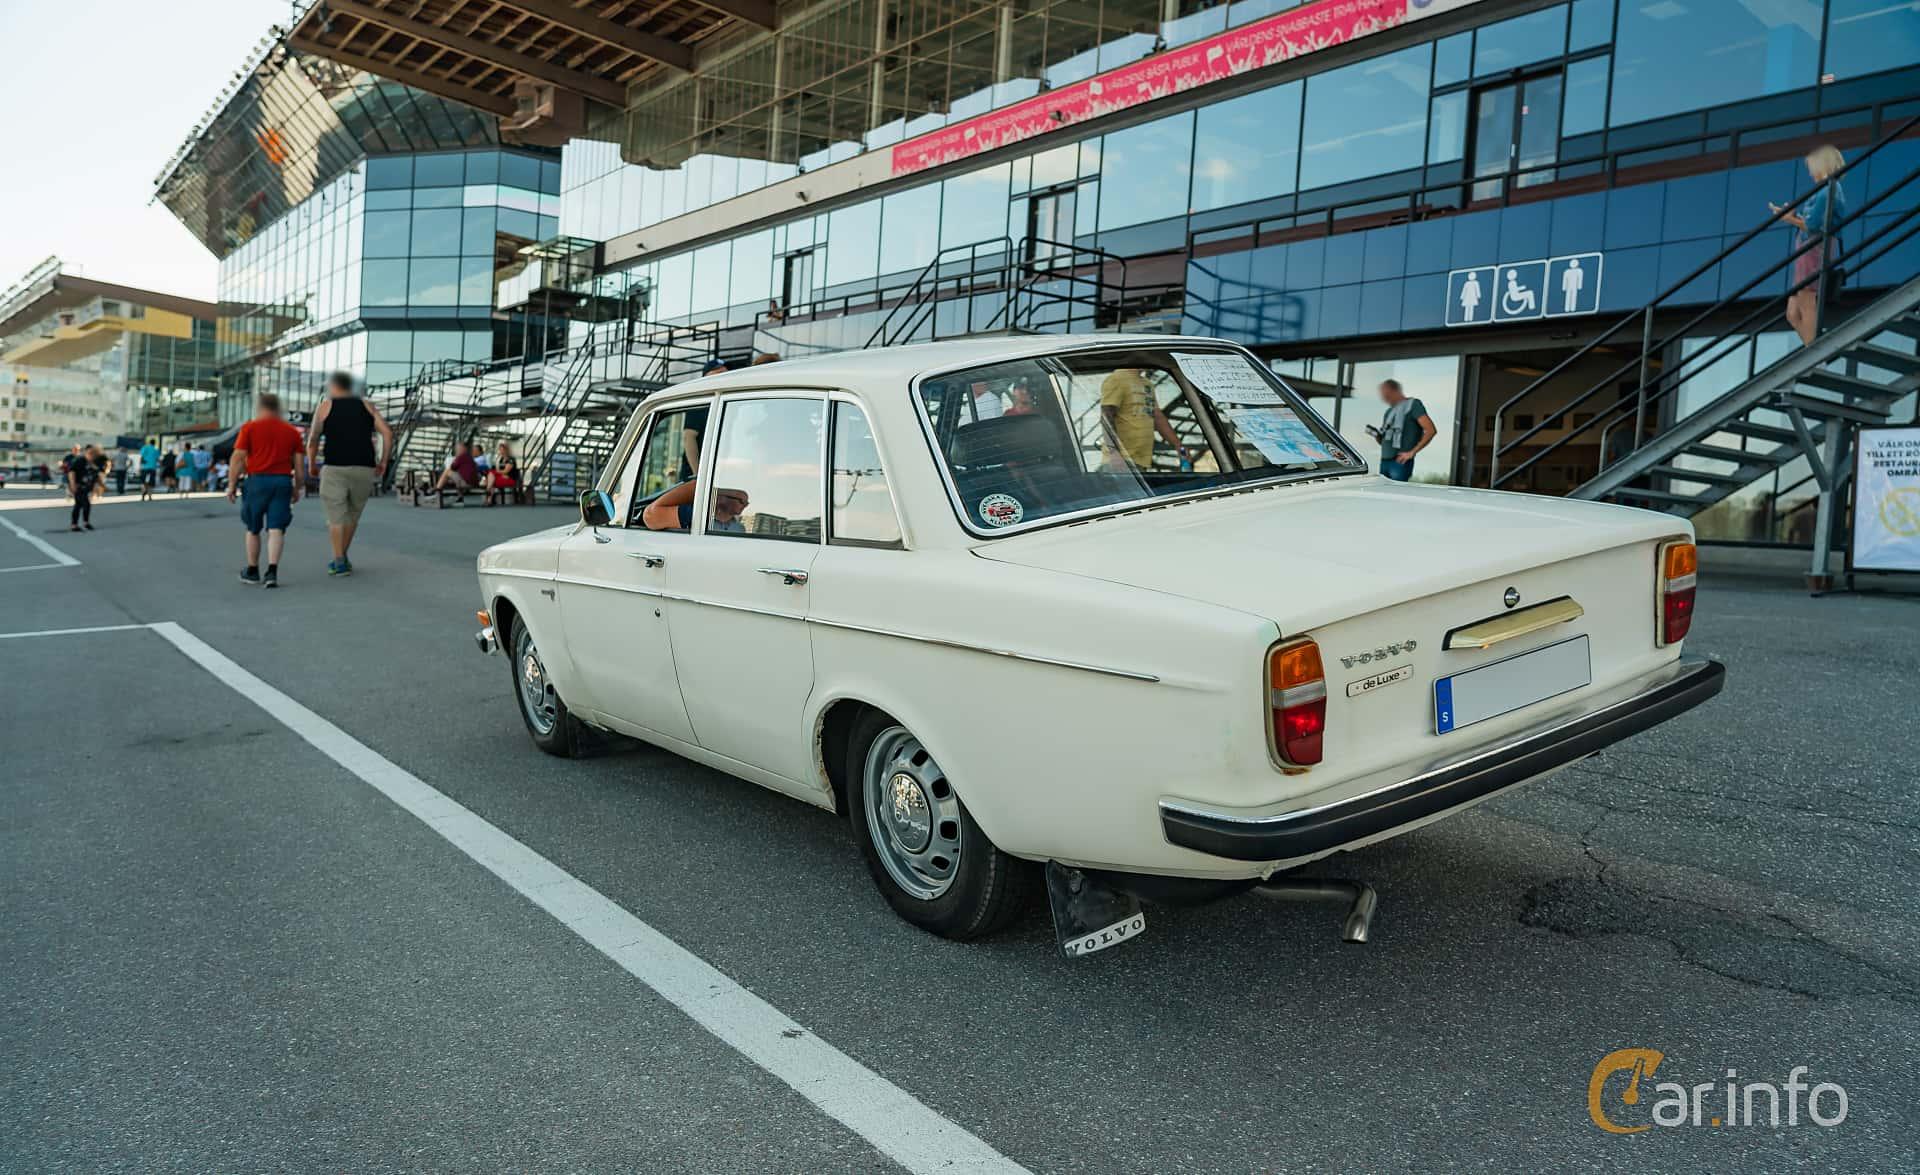 Volvo 144 2.0 Manual, 82hp, 1971 at Stockholm Vintage & Sports Car meet 2019